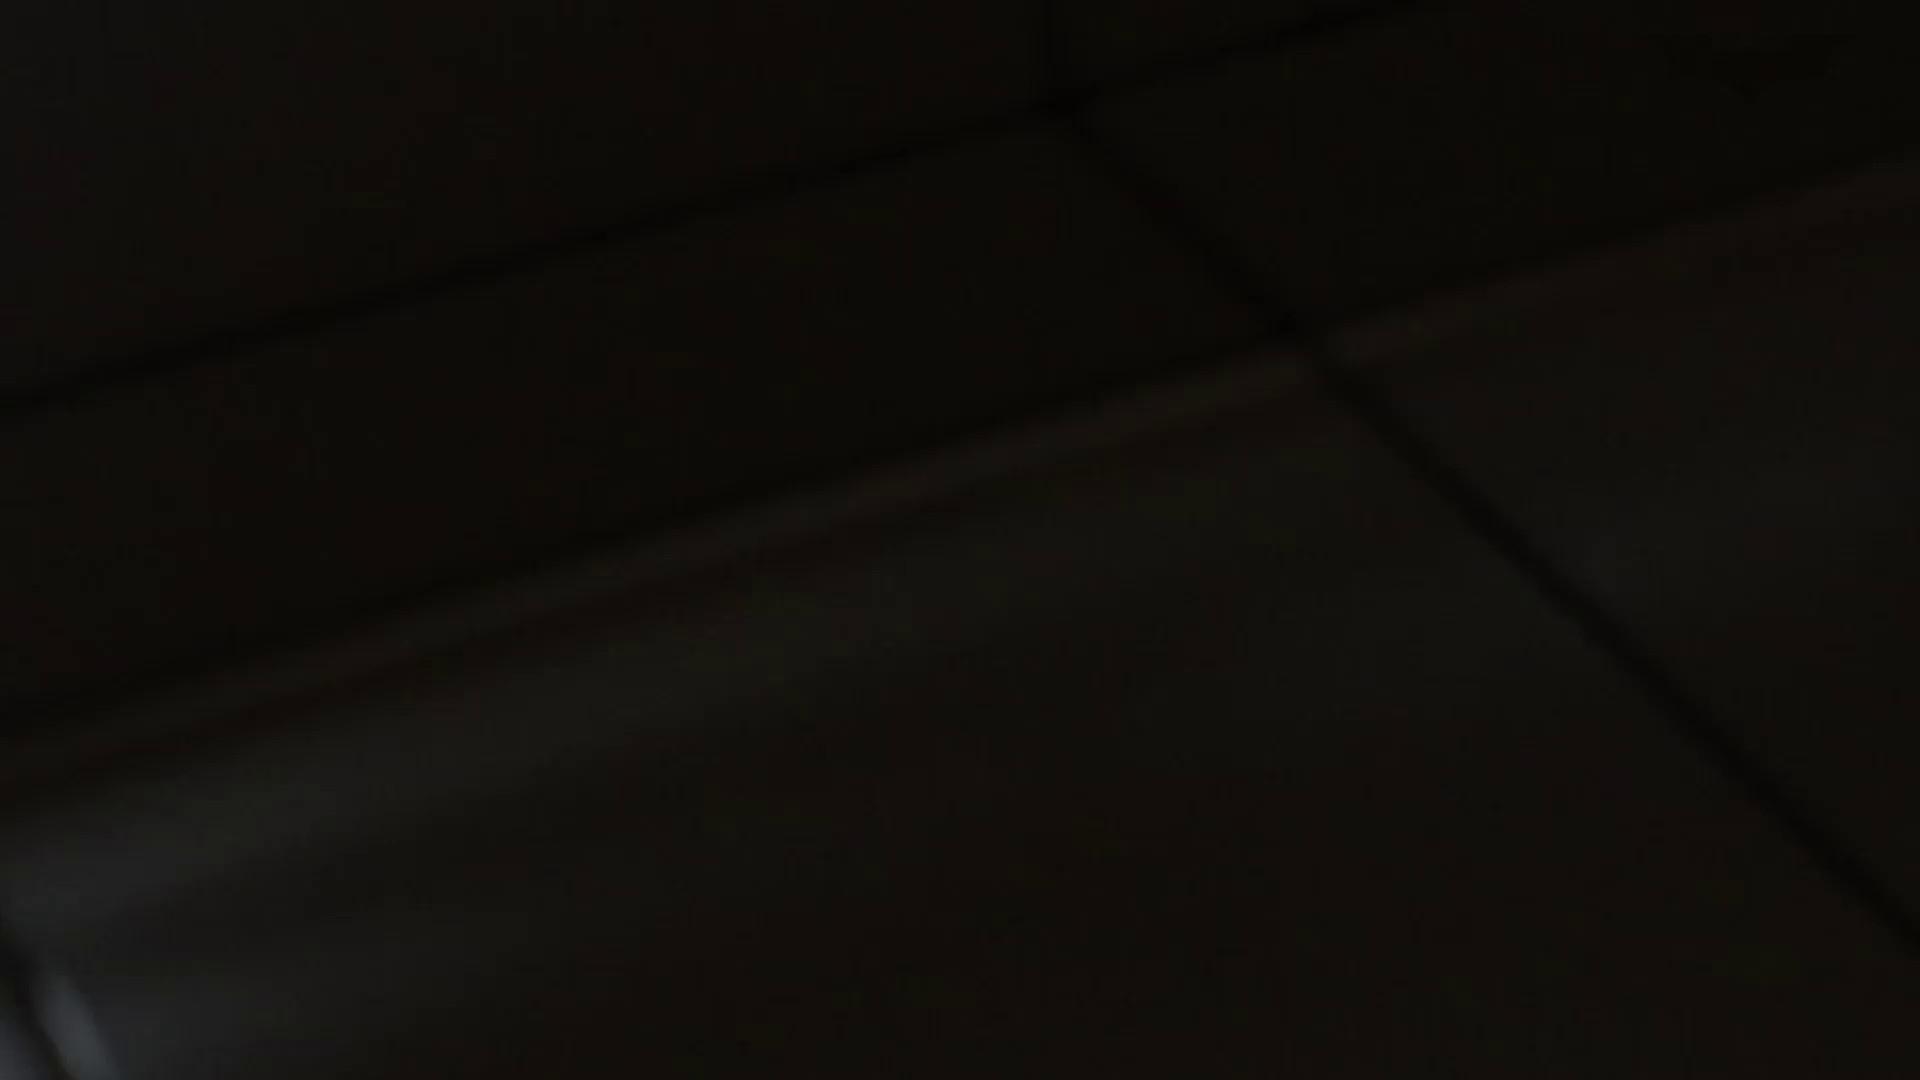 JD盗撮 美女の洗面所の秘密 Vol.74 高画質動画 AV無料 109画像 108